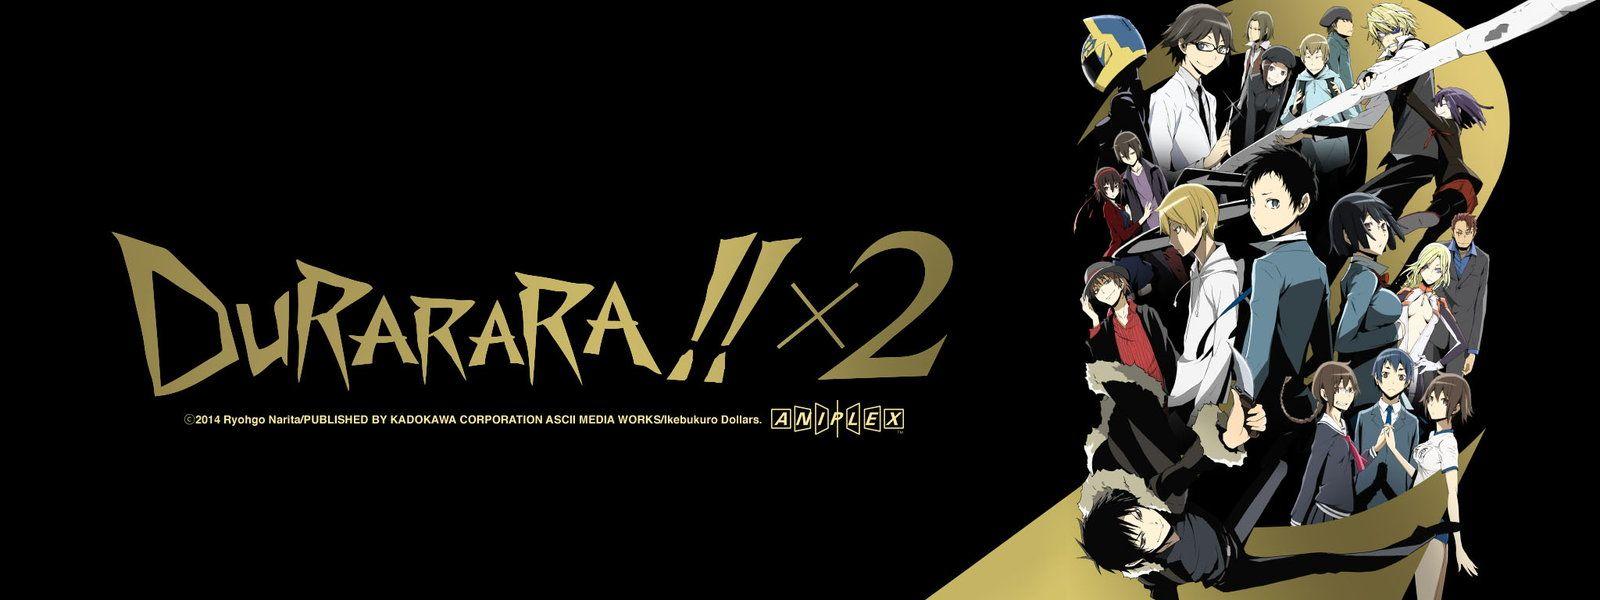 Durarara!! 2nd Season JustDubs Online Dubbed Anime